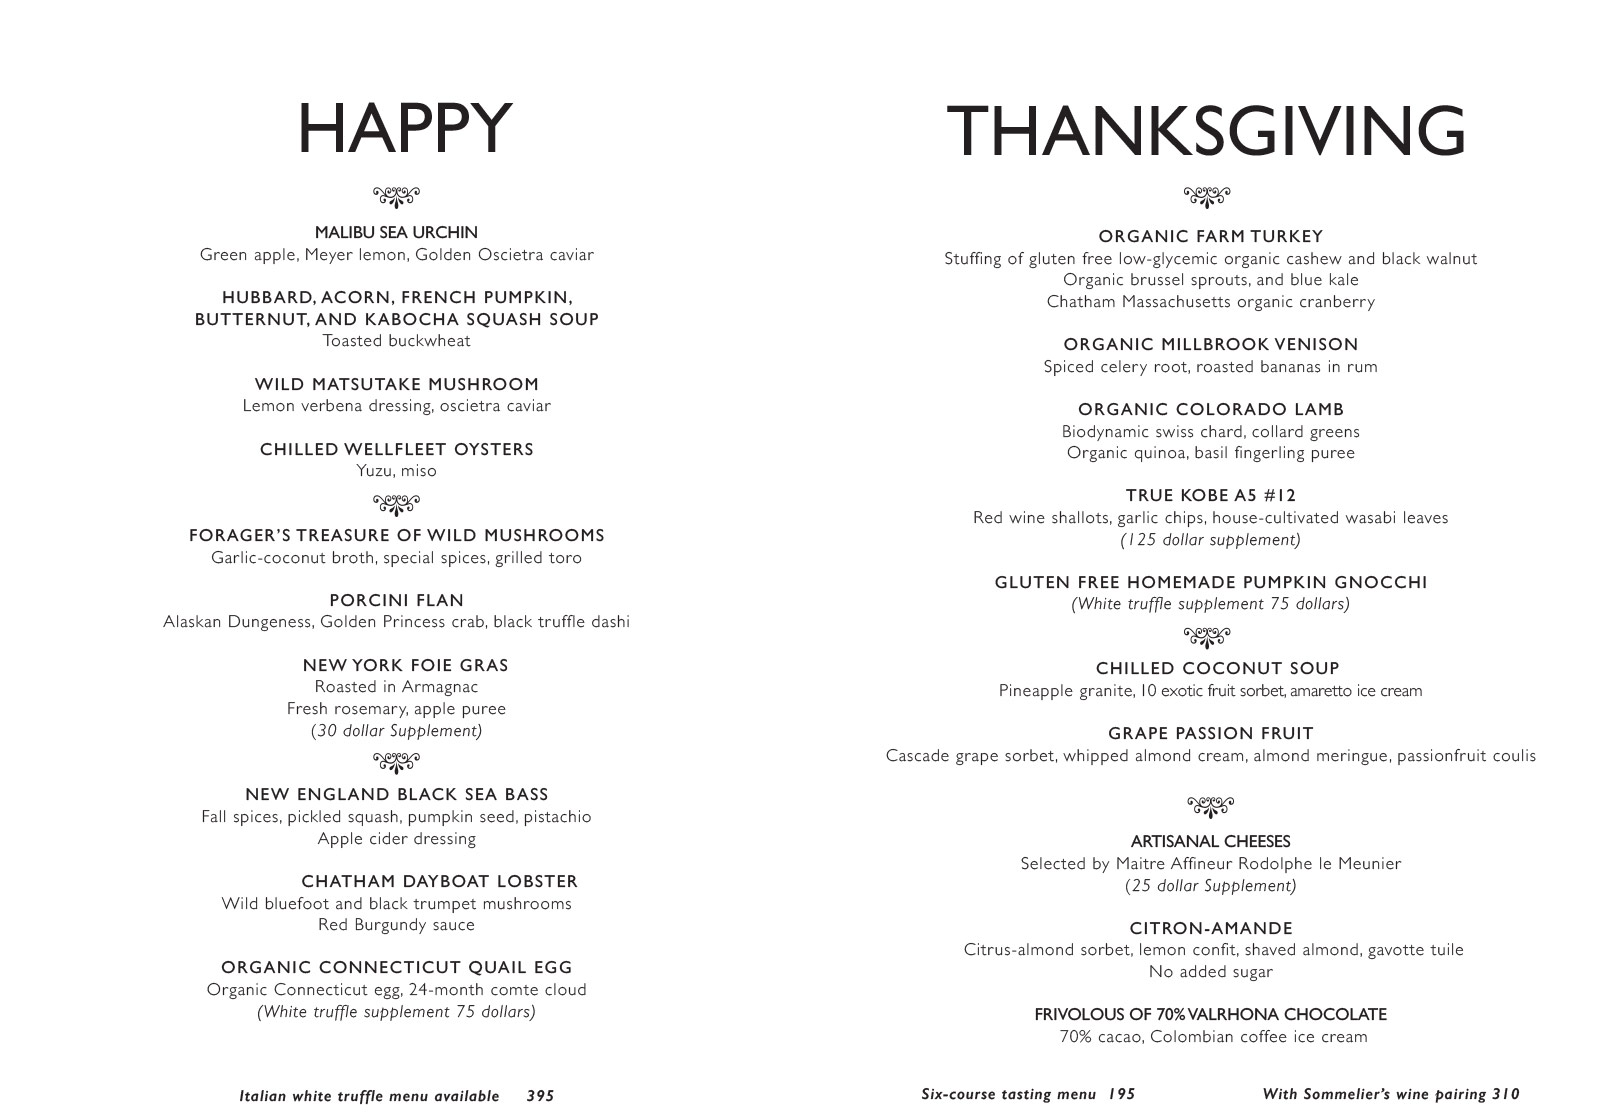 Bouley Thanksgiving